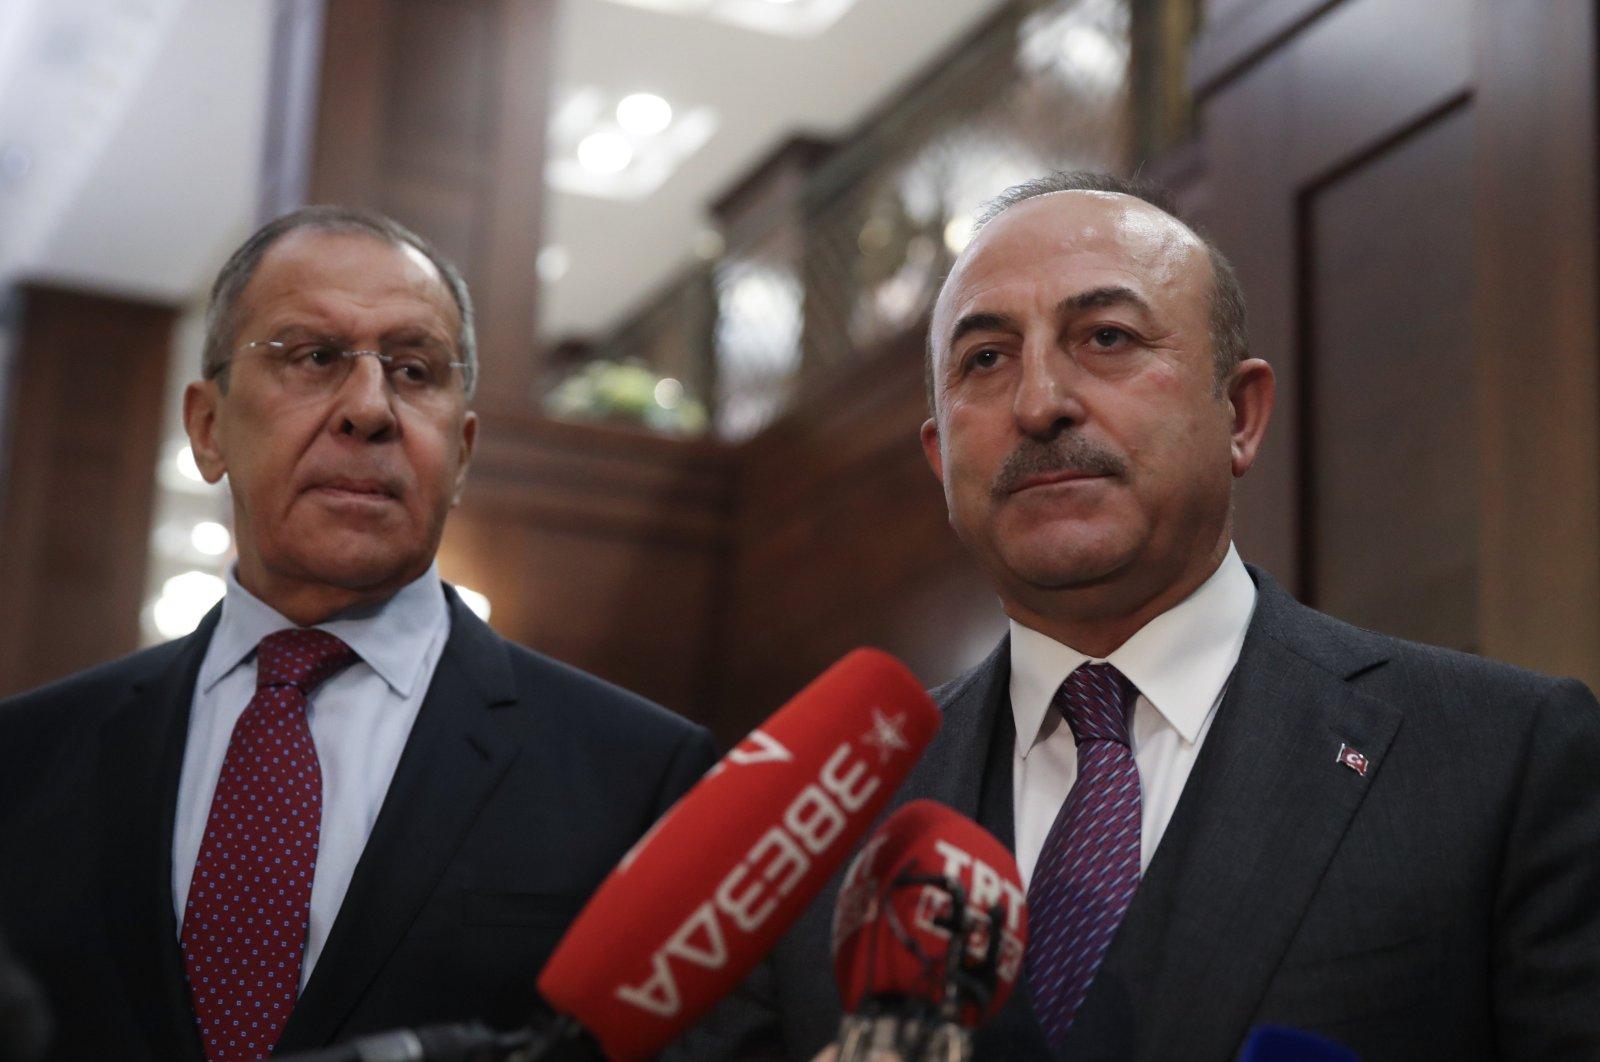 Foreign Minister Mevlüt Çavuşoğlu (R) and Russian Foreign Minister Sergey Lavrov address journalists following a meeting, Dec. 30, 2018. (AA File Photo)